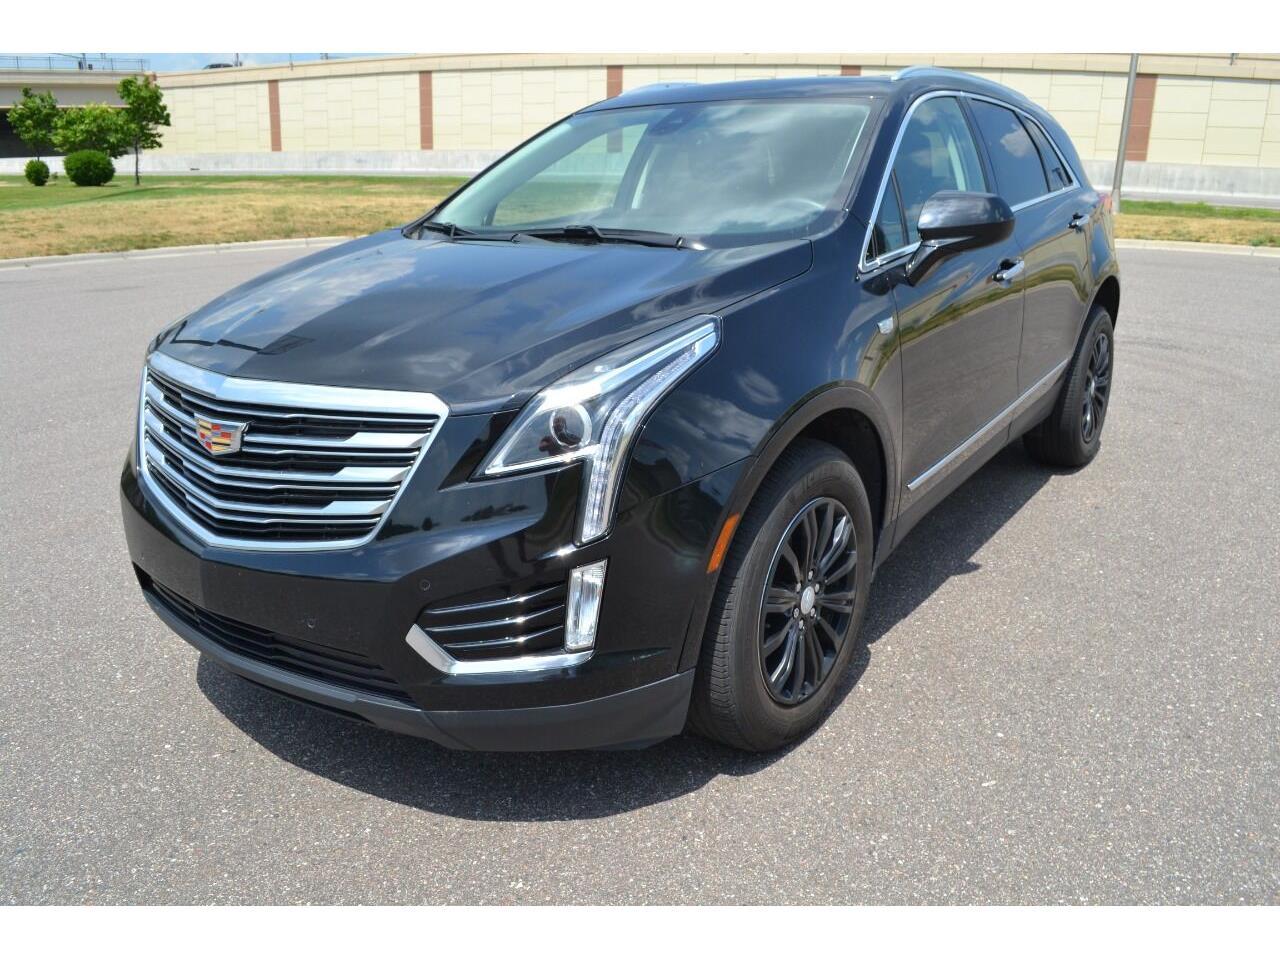 2017 Cadillac XT5 (CC-1362165) for sale in Ramsey, Minnesota